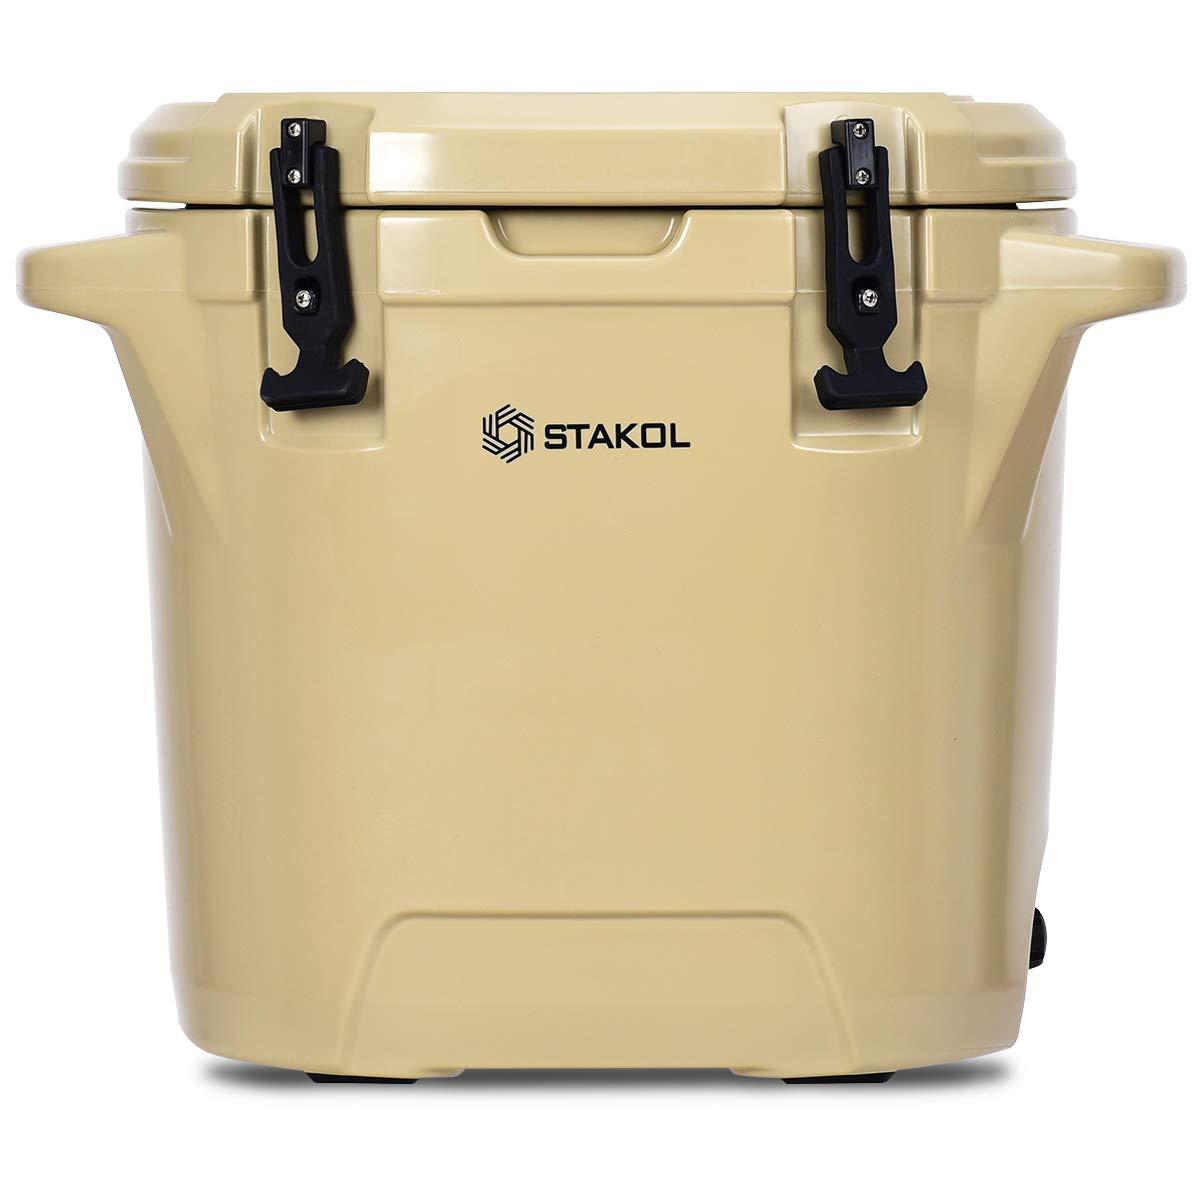 Liberory 25L Outdoor Ice Cooler Heavy Duty Ice Freezer Round Ice Chest Patio Gray